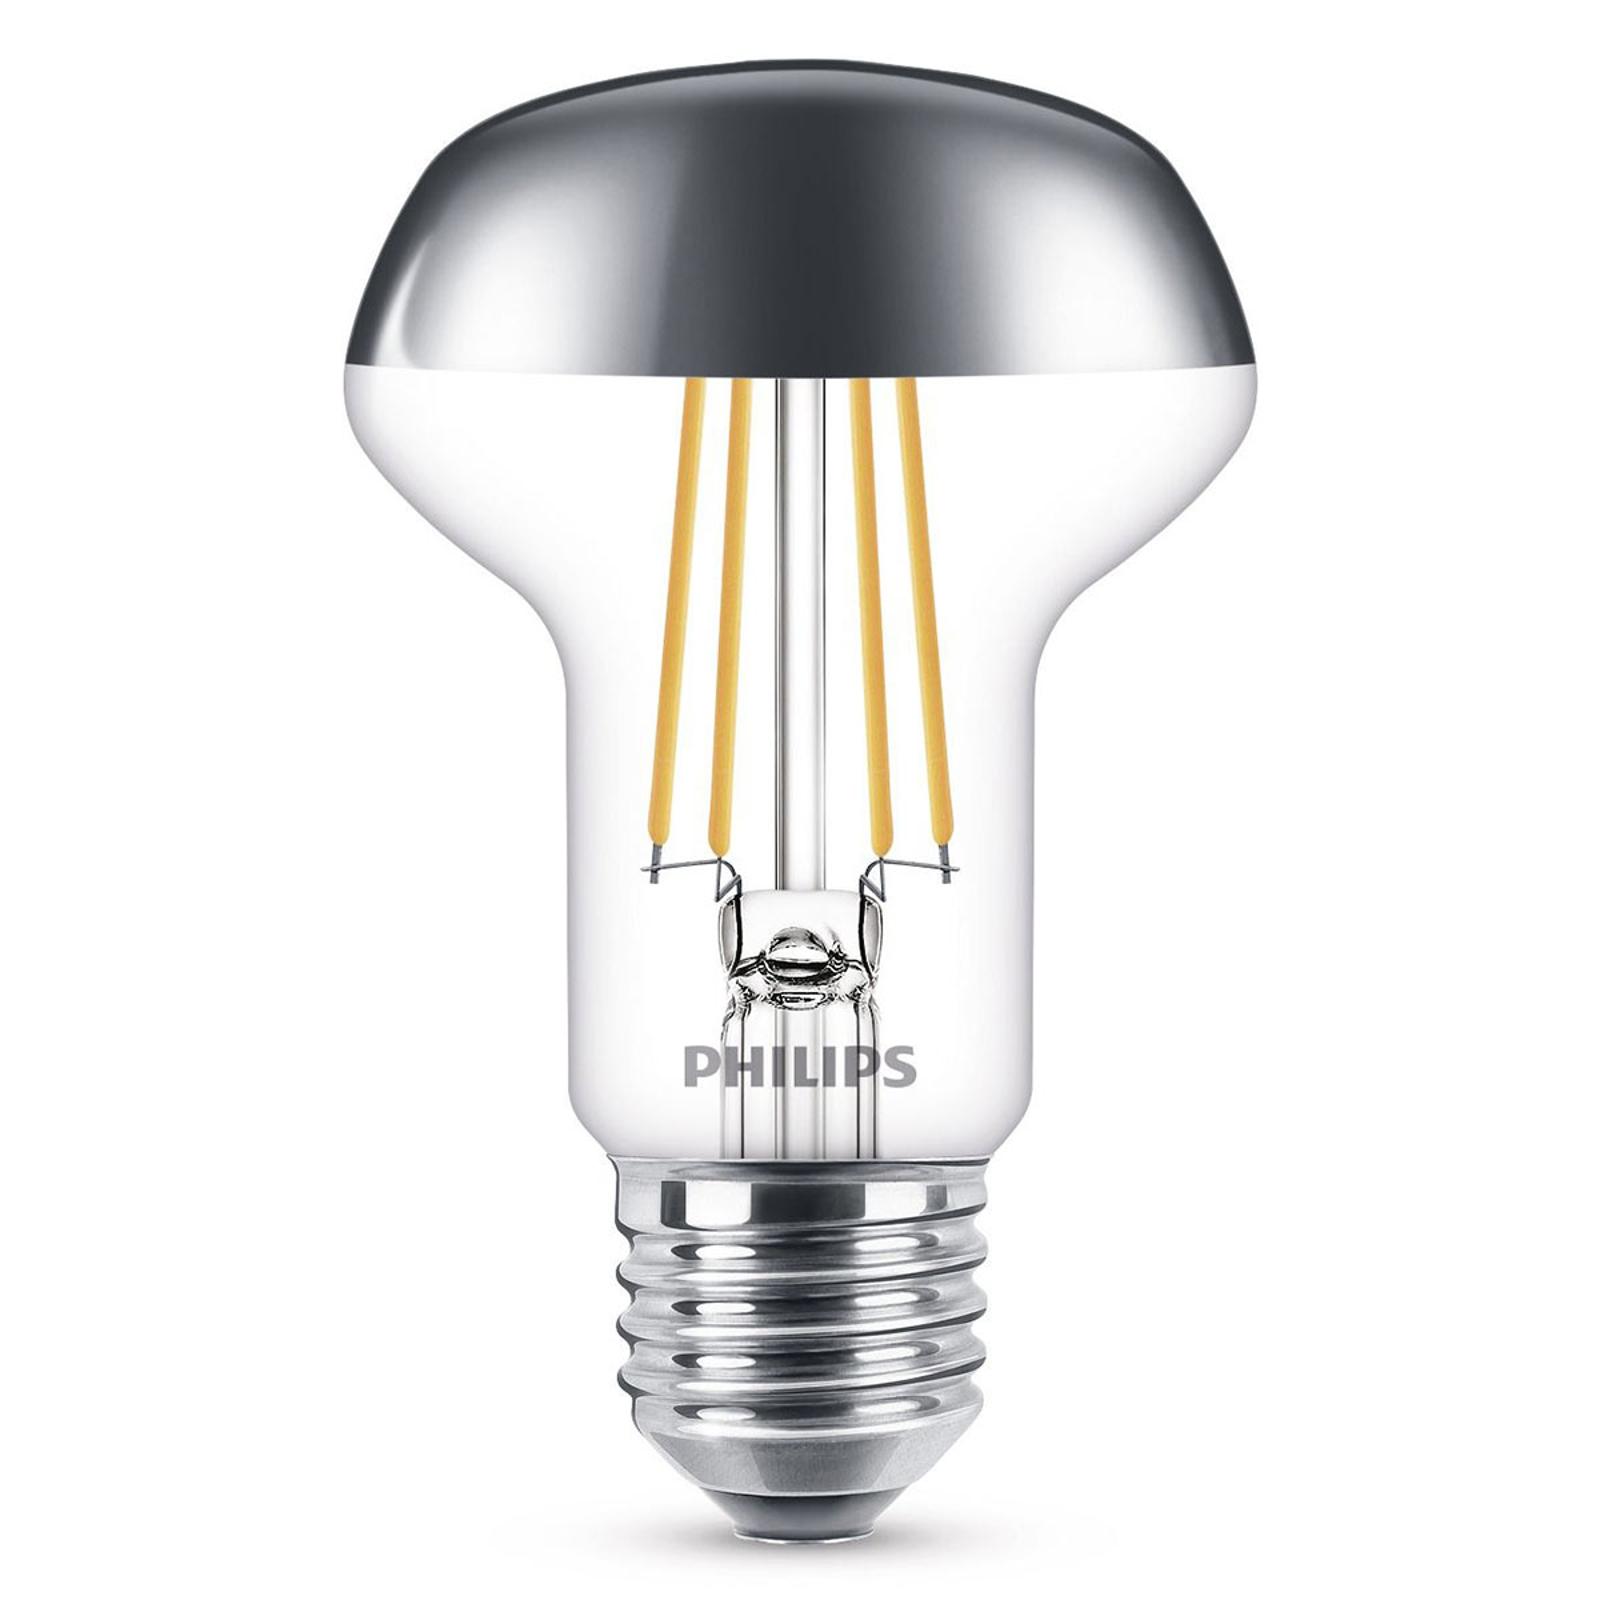 Philips E27 R63 LED-Reflektor 827 4W Kopfspiegel